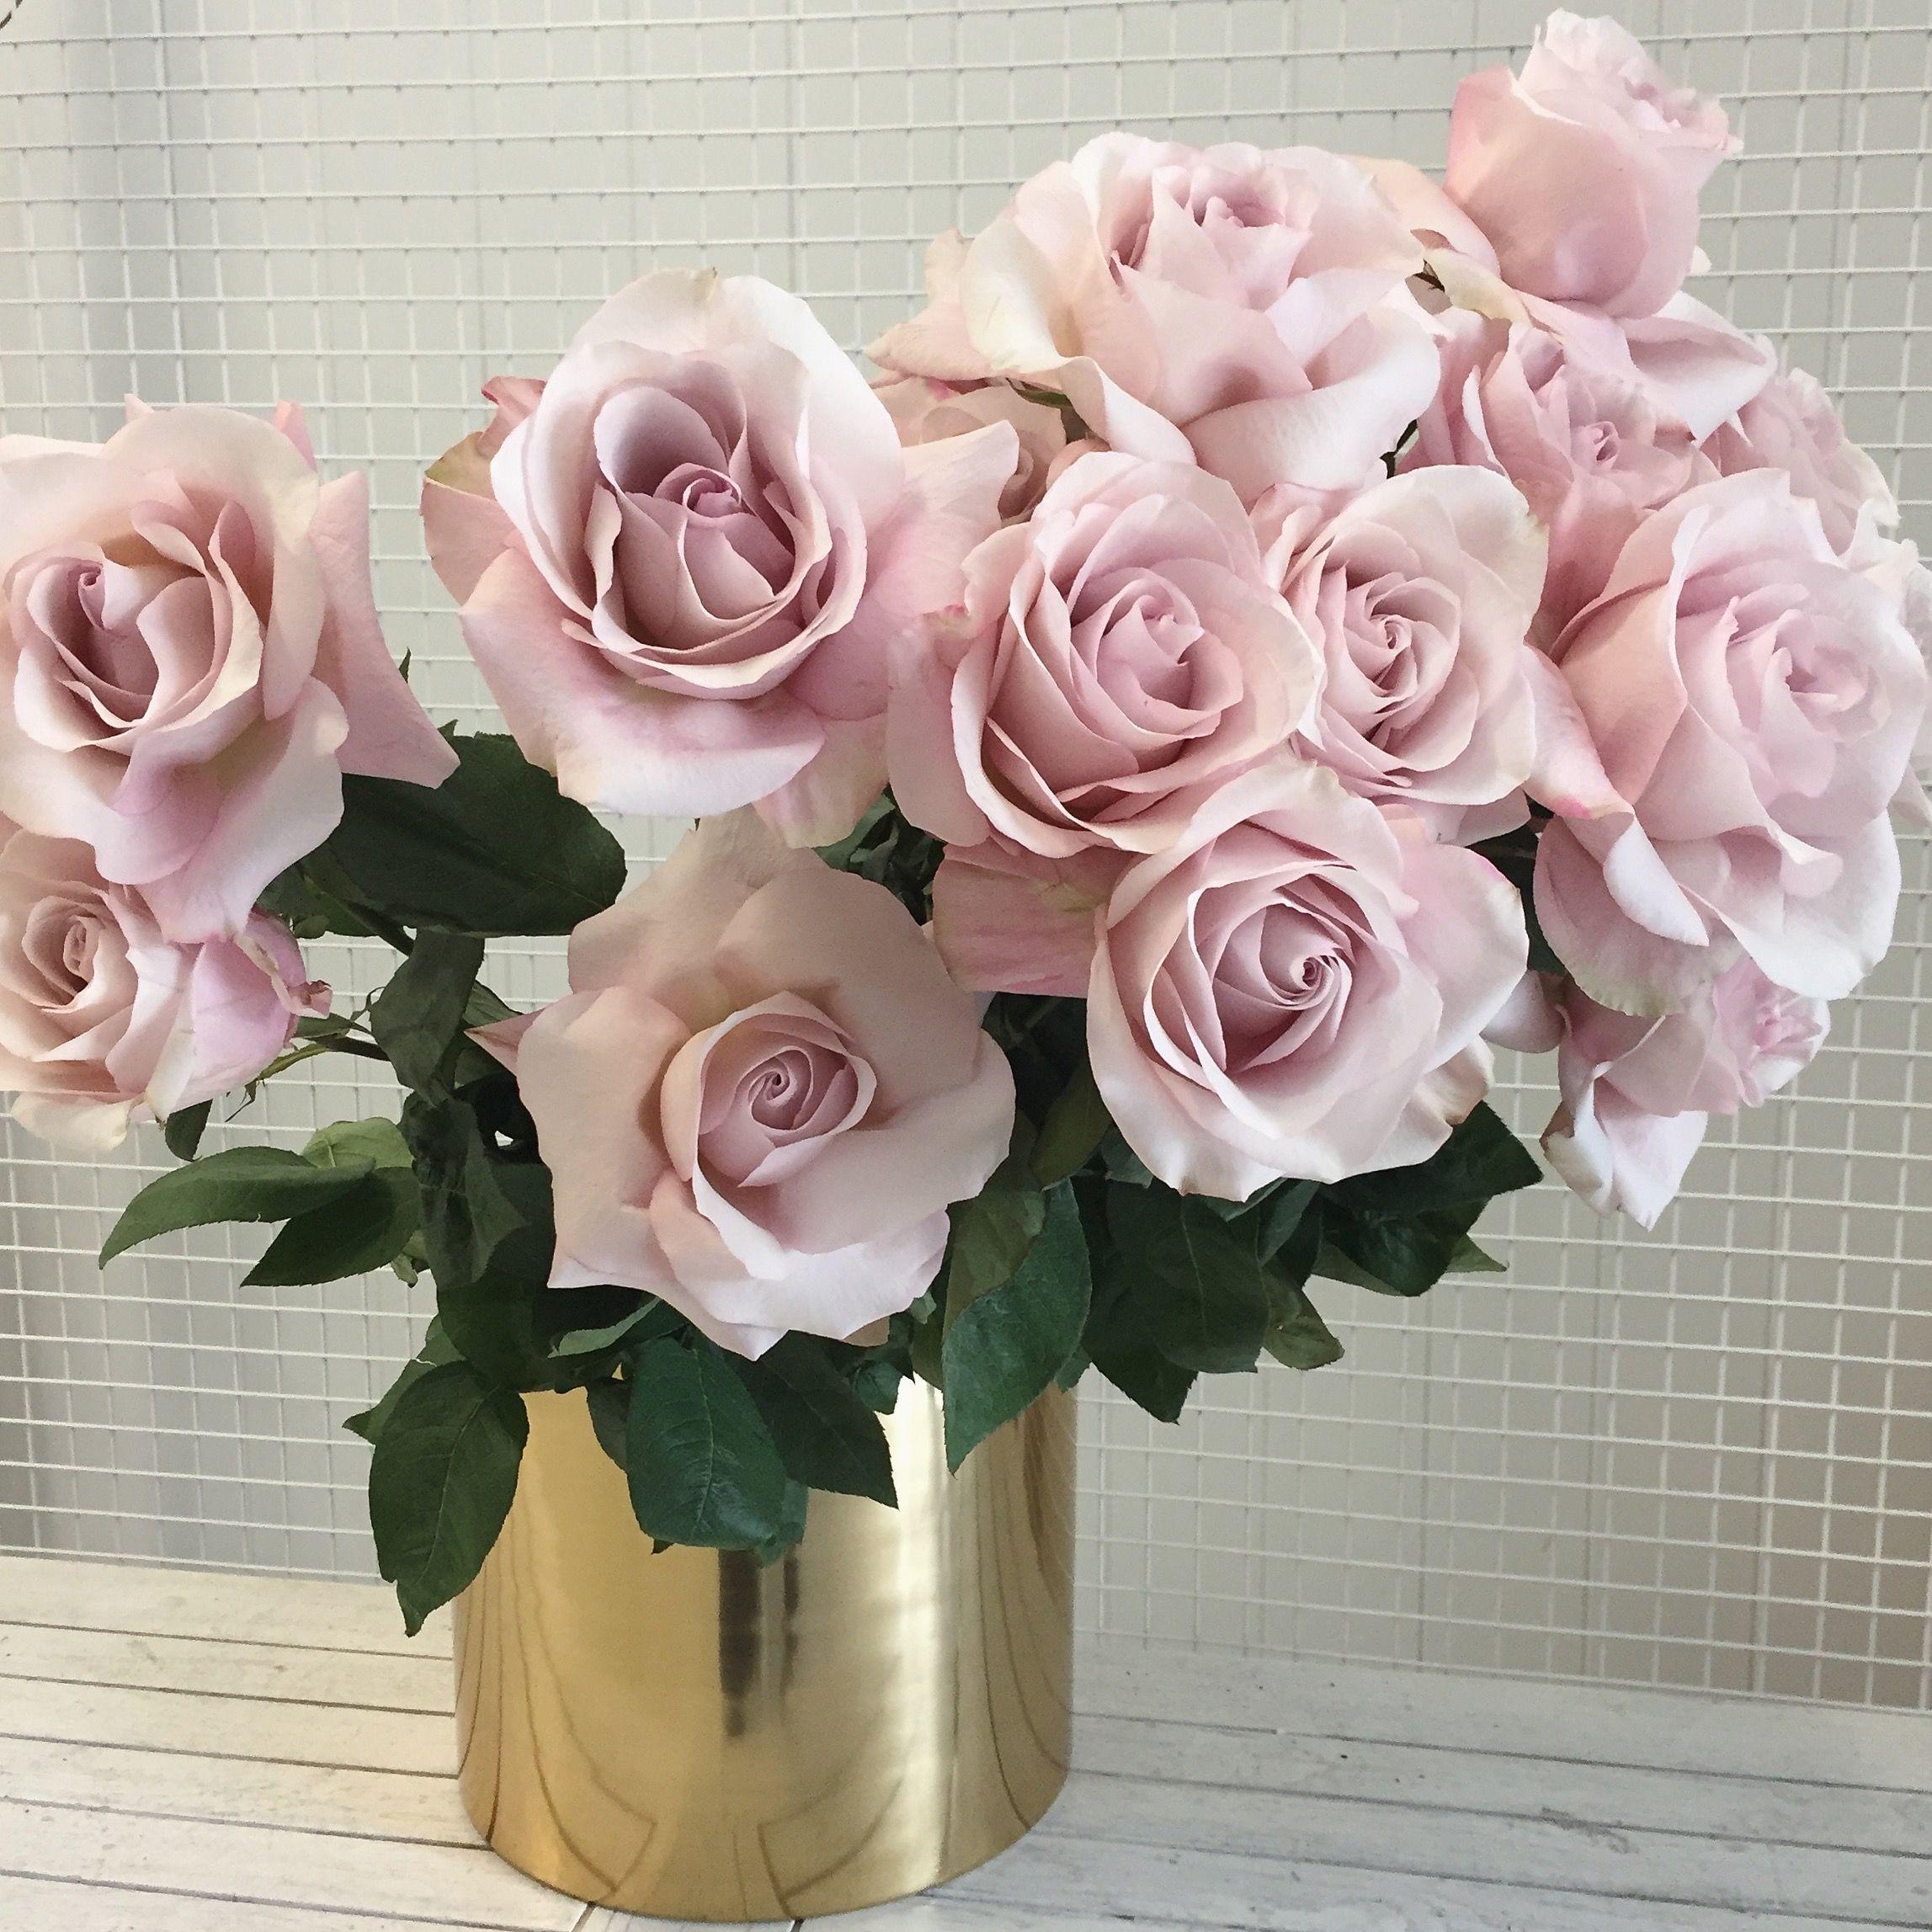 Pin by anna cimicky on floral portfolio pinterest